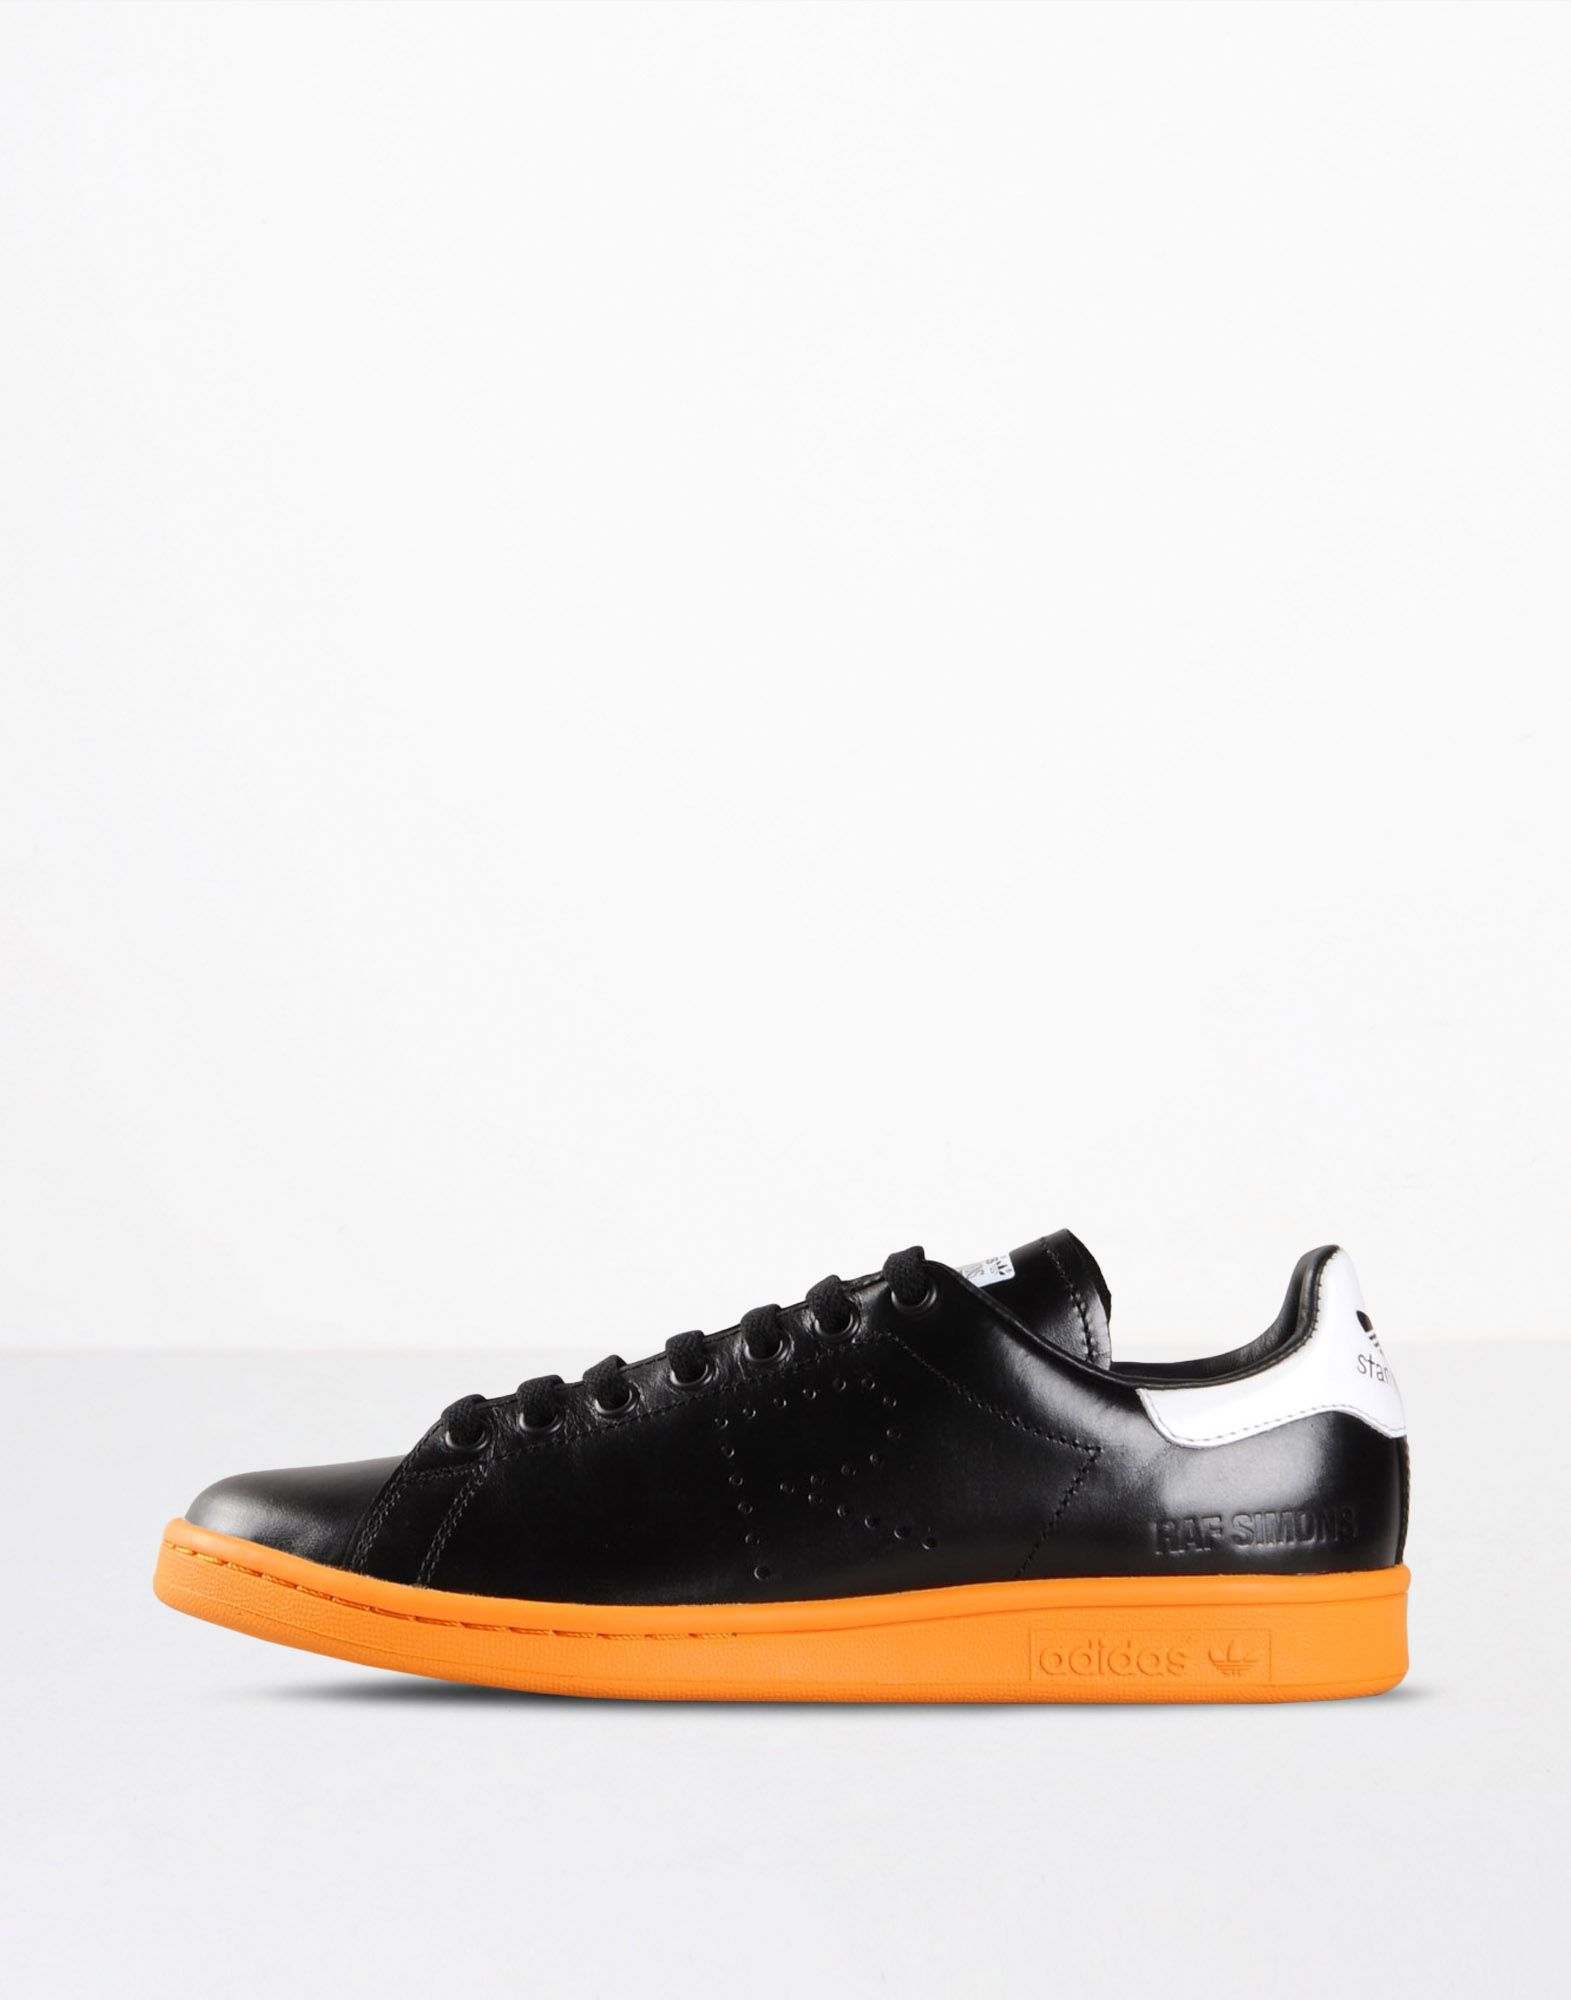 sneakers adidas x raf simons stan smith f r f r sie. Black Bedroom Furniture Sets. Home Design Ideas